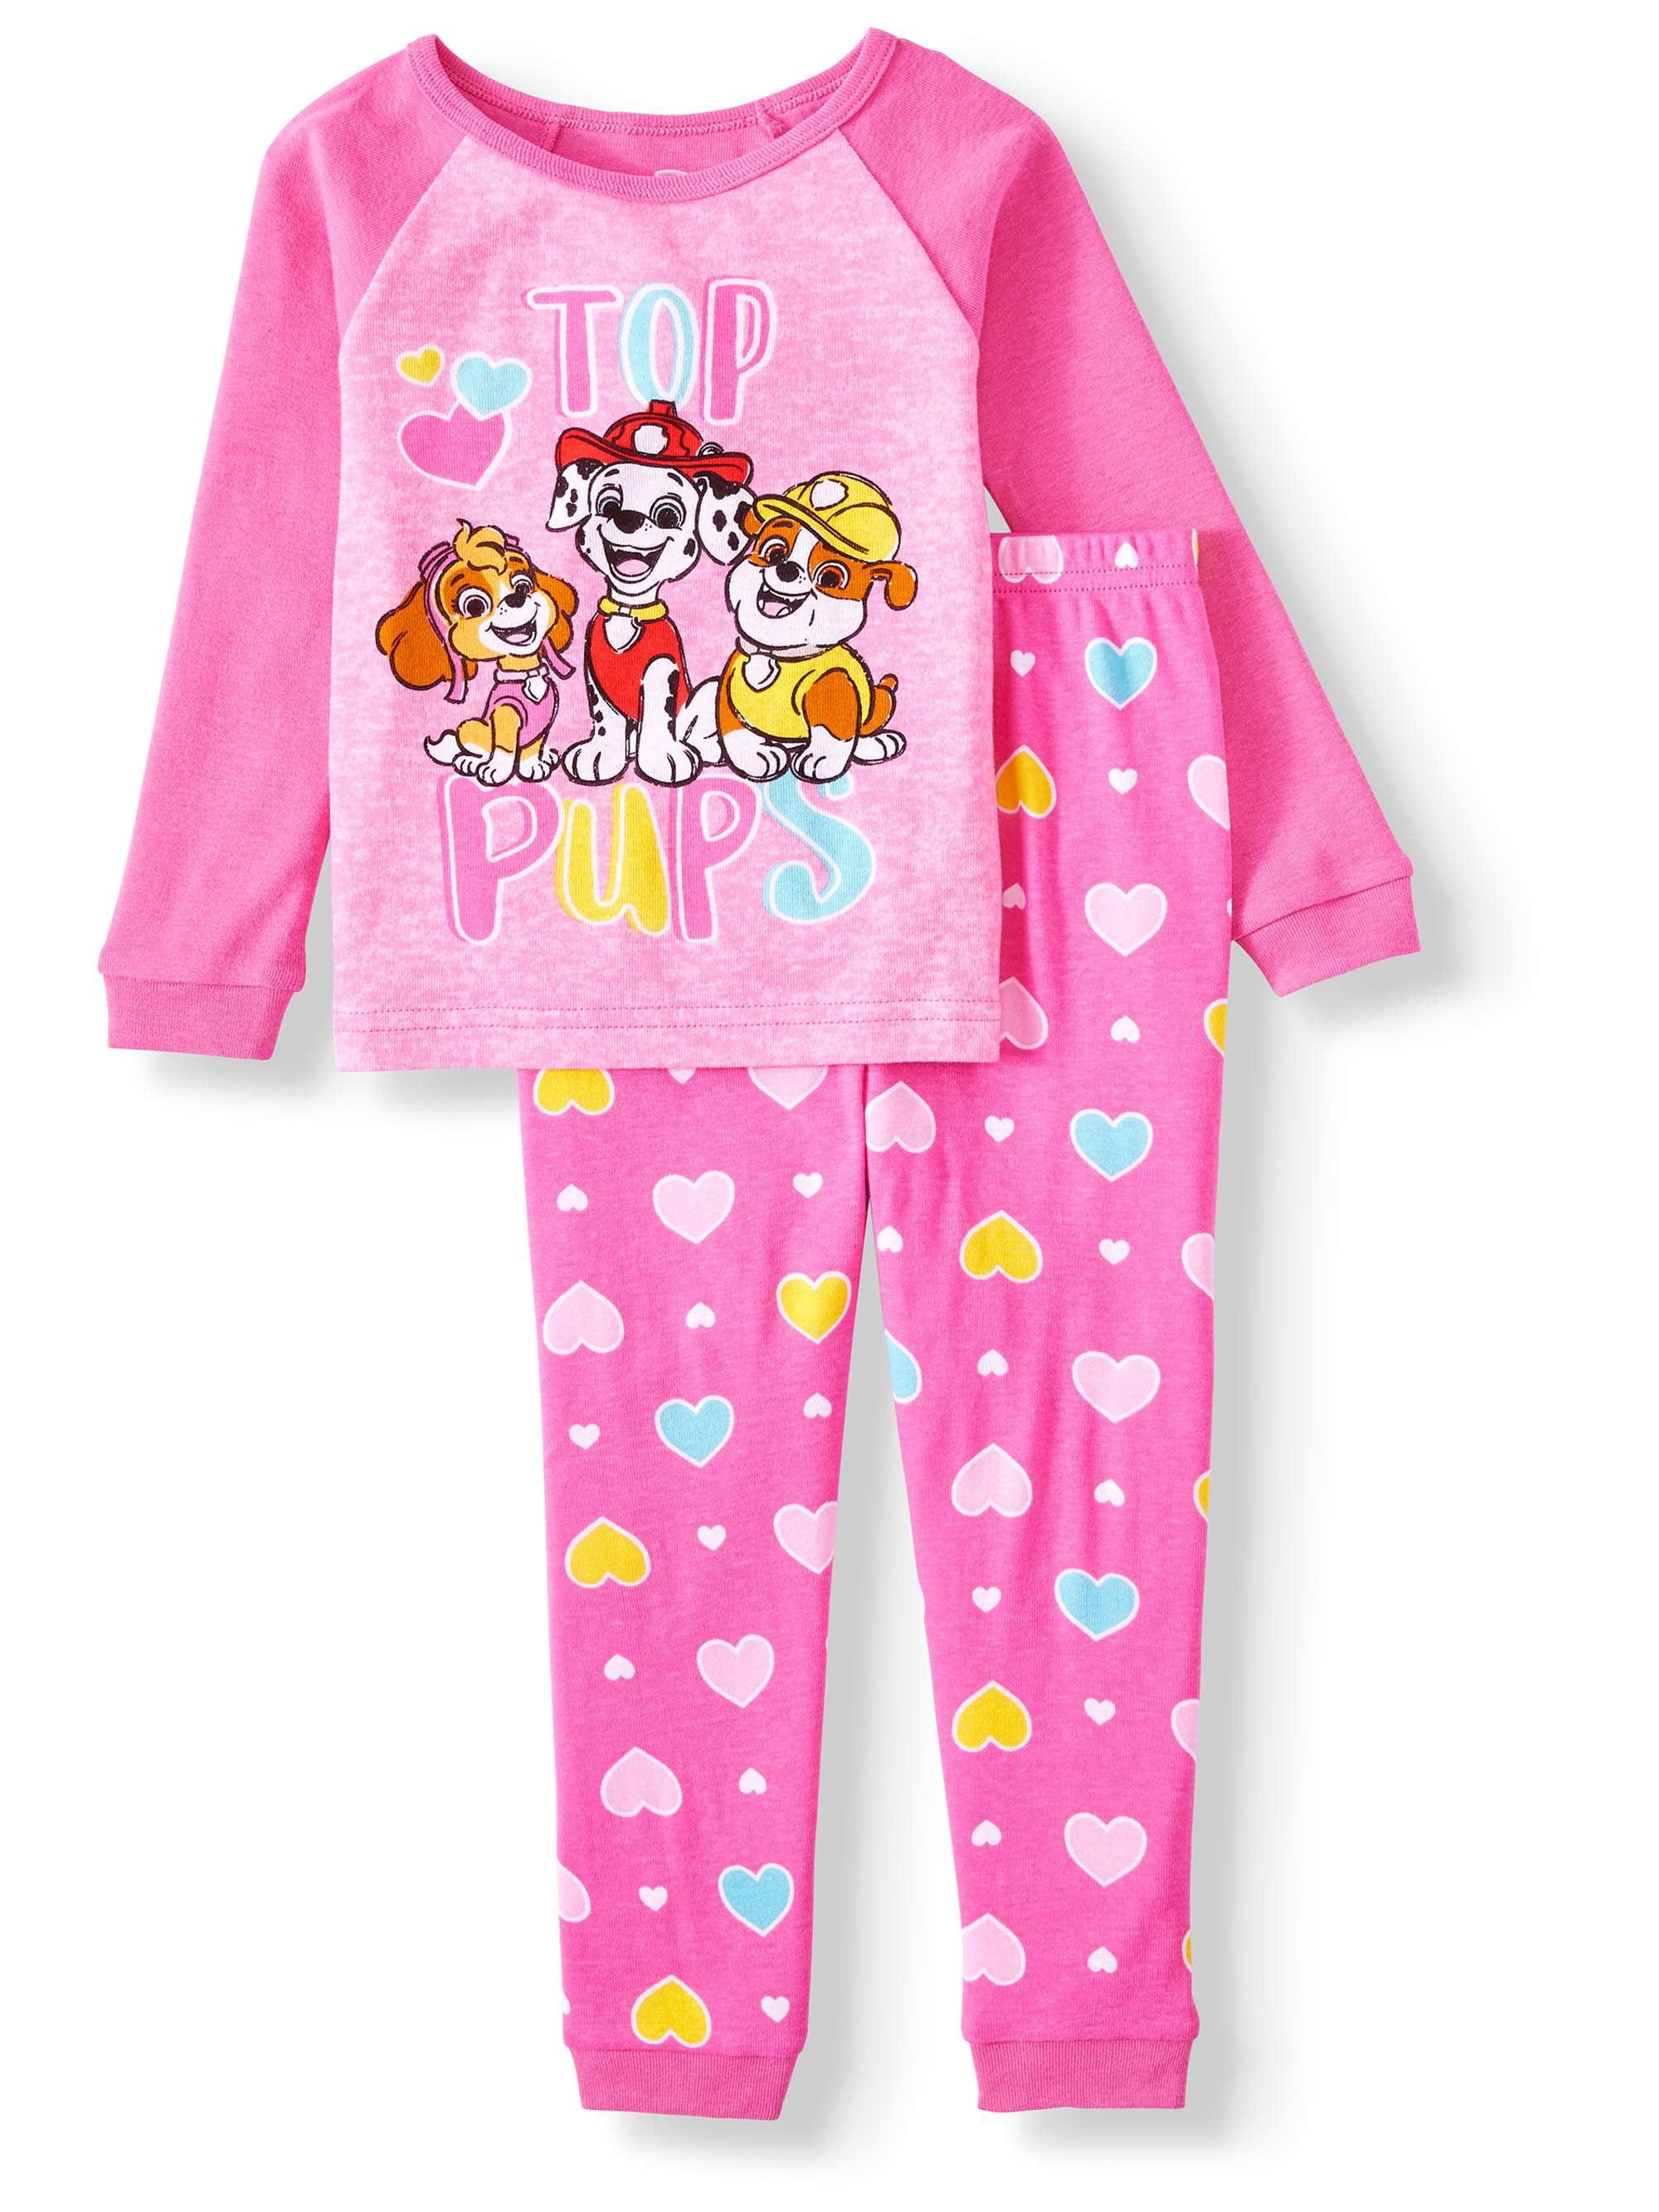 Peanuts Girls Toddler 4 Piece Cotton Pajama Set